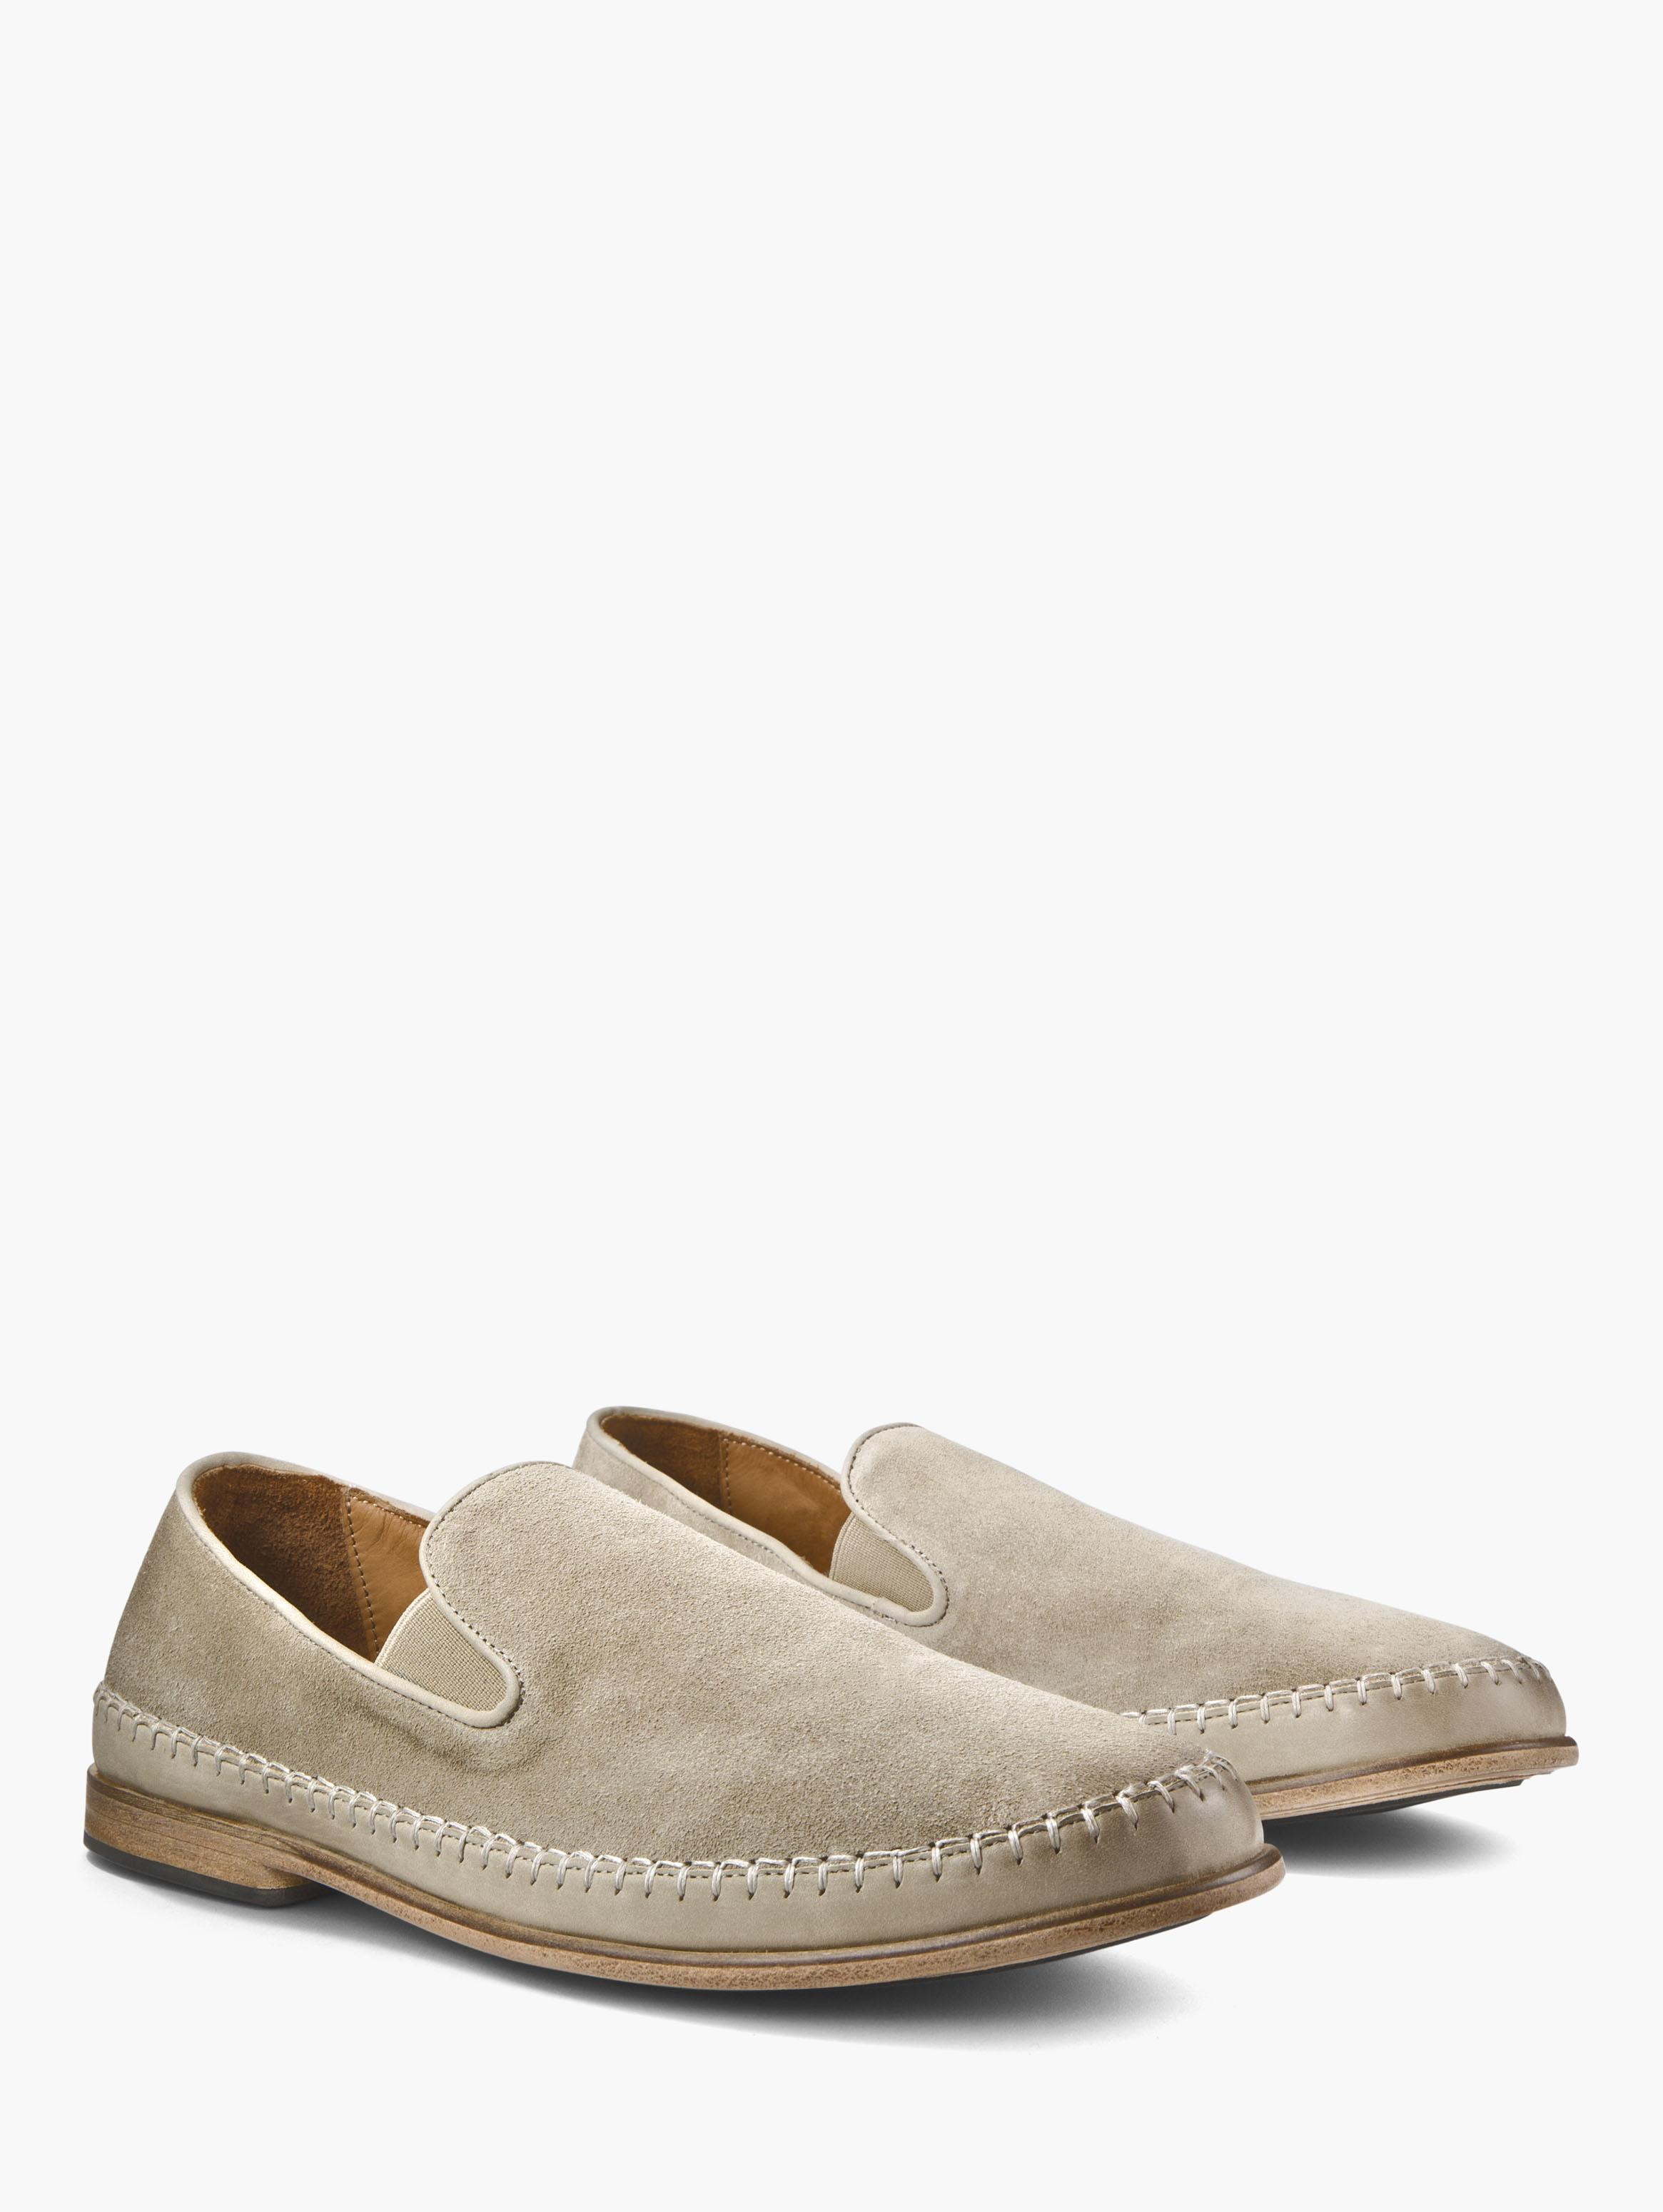 Jv Collection Shoes John Varvatos